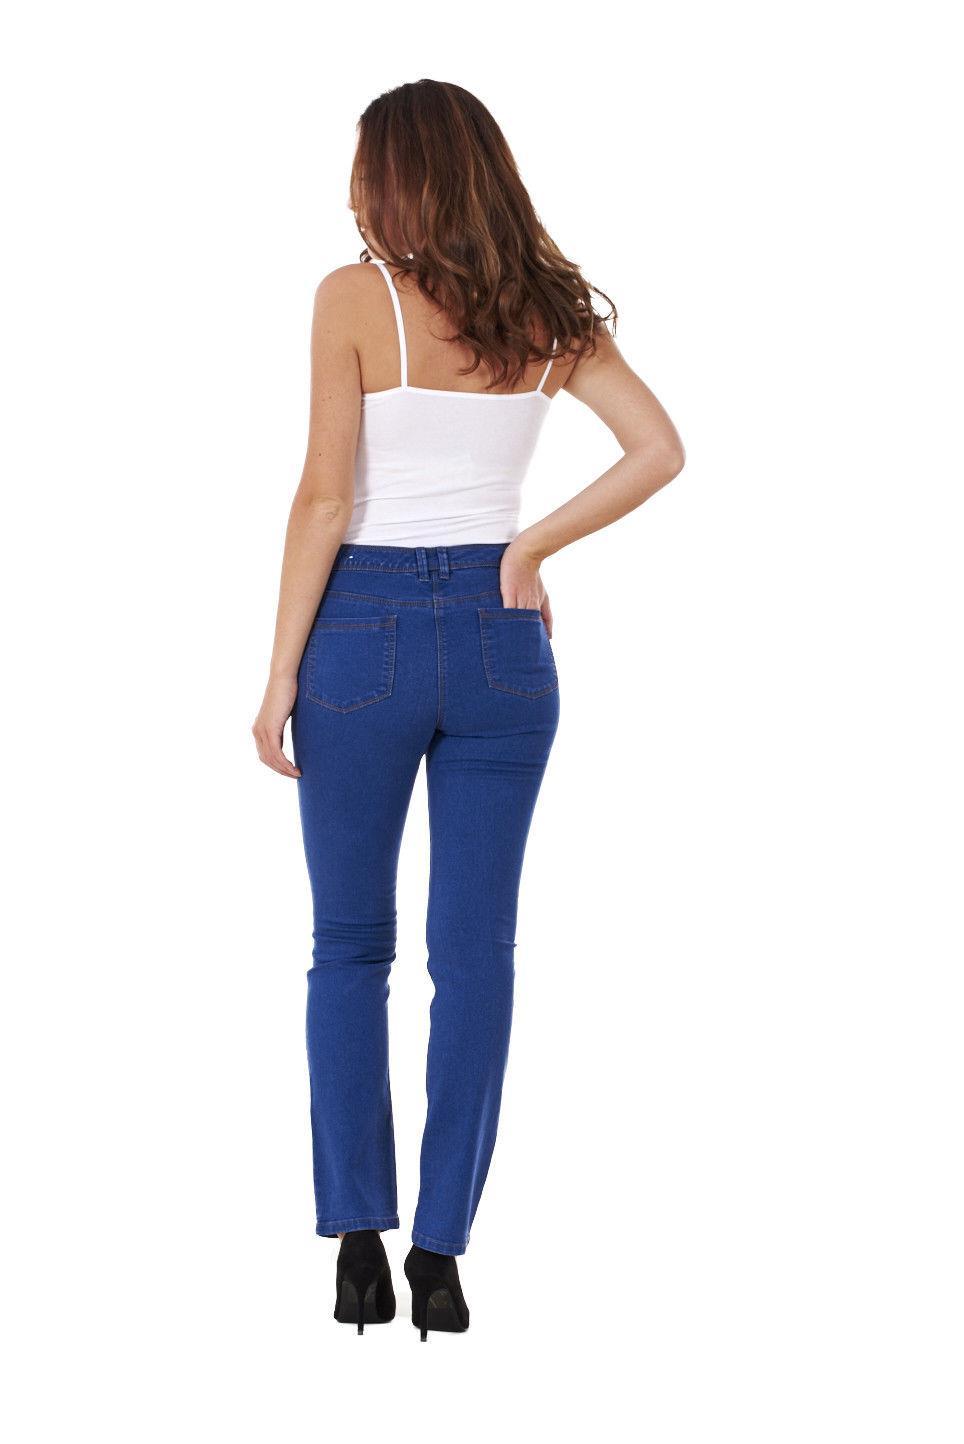 Ladies-Straight-Leg-Denim-Womens-Pants-Stretch-Regular-Fit-Jeans thumbnail 15